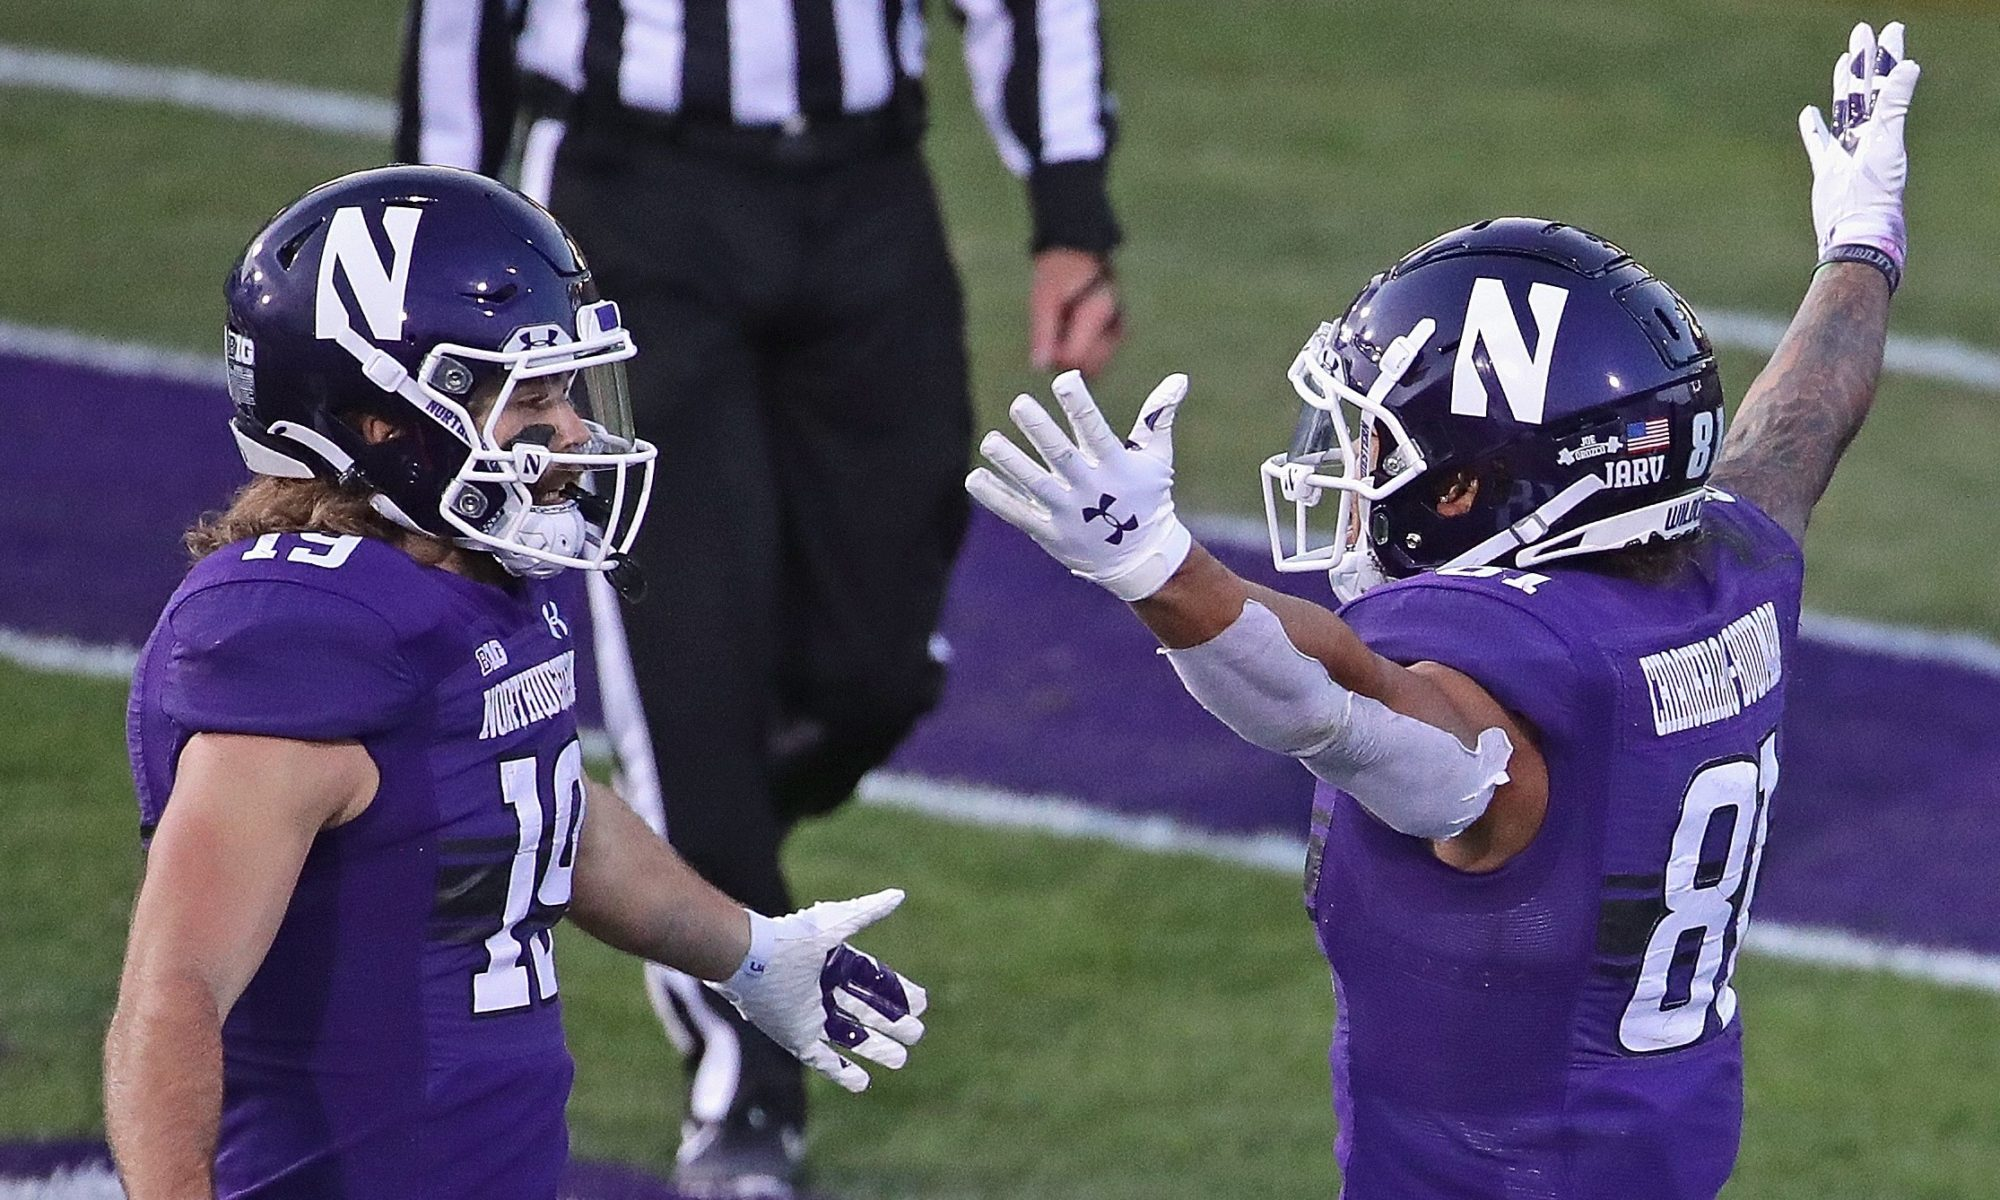 ncaa-college football-national championship-odds-picks-2020